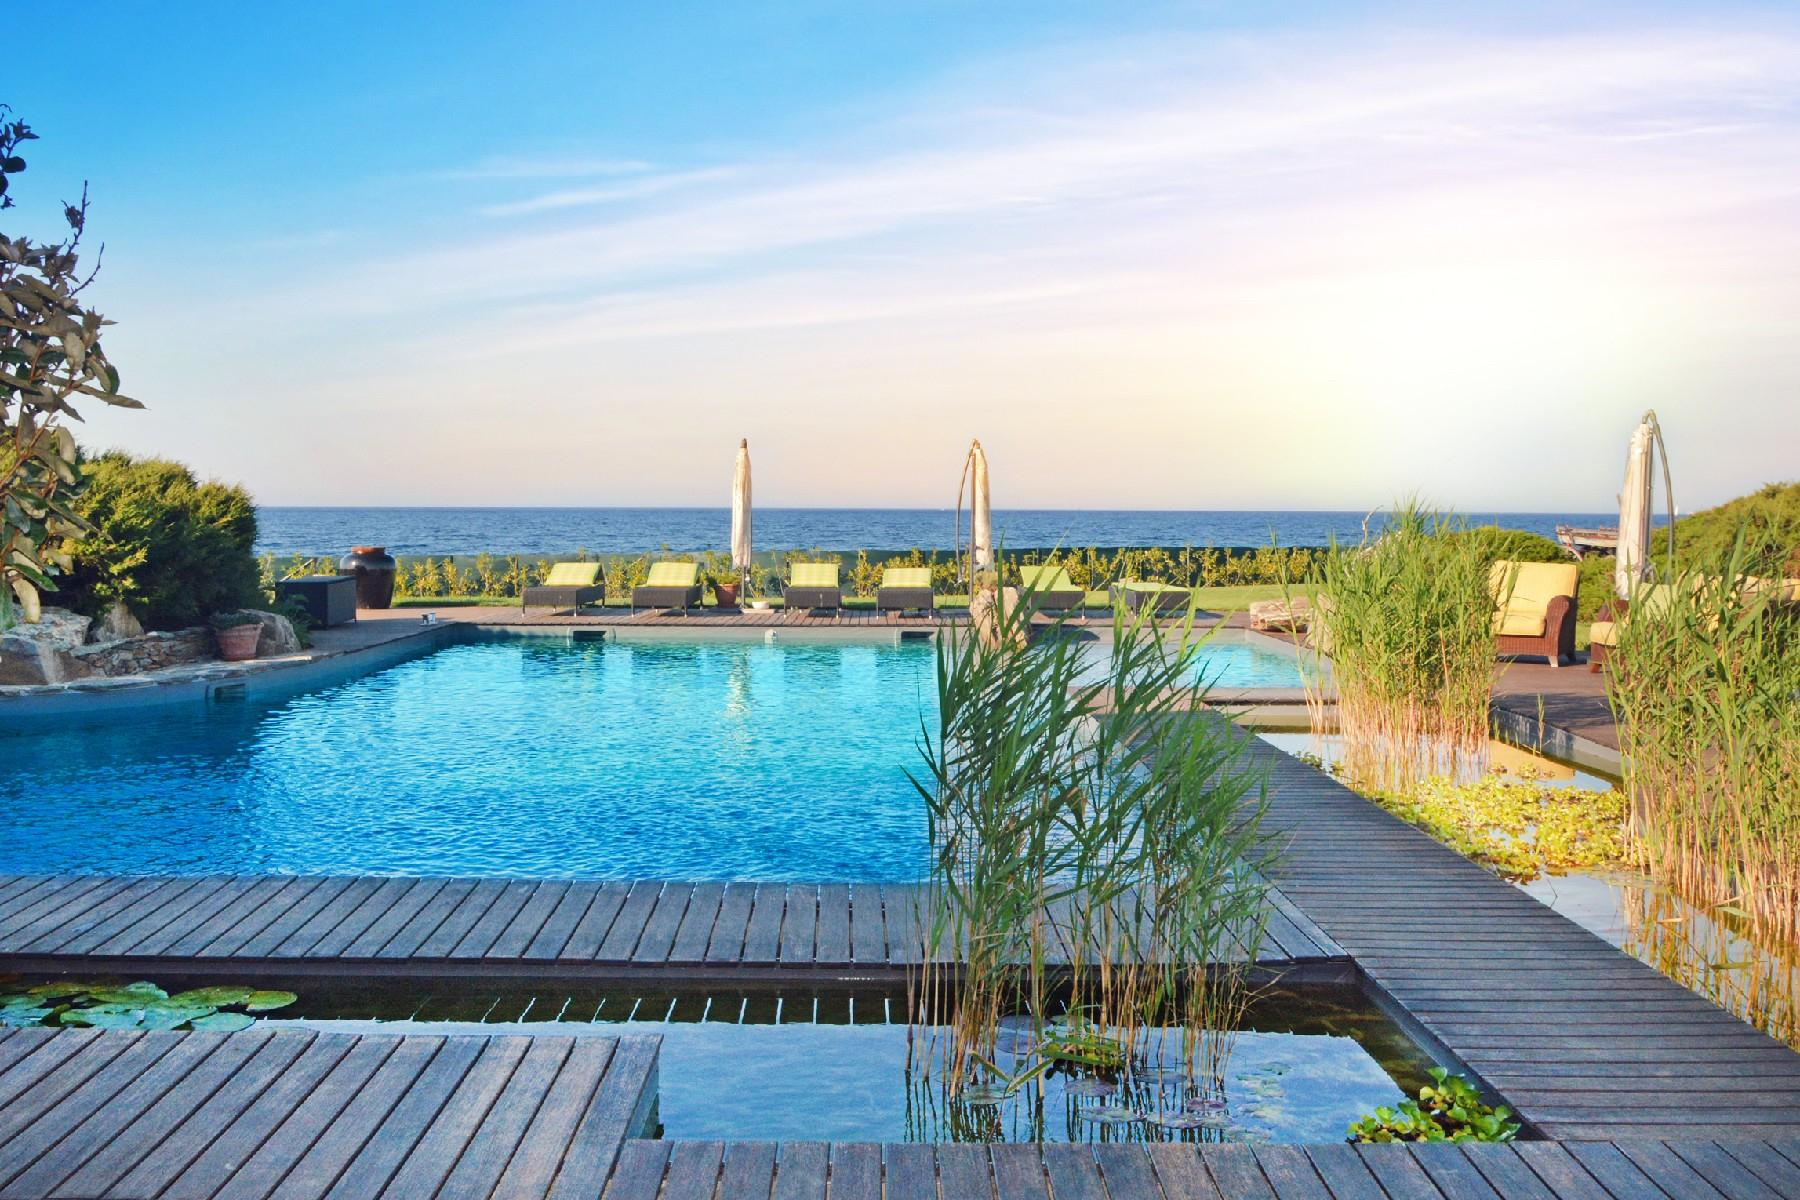 Villa pieds-dans-l'eau su una piccola penisola privata - 5